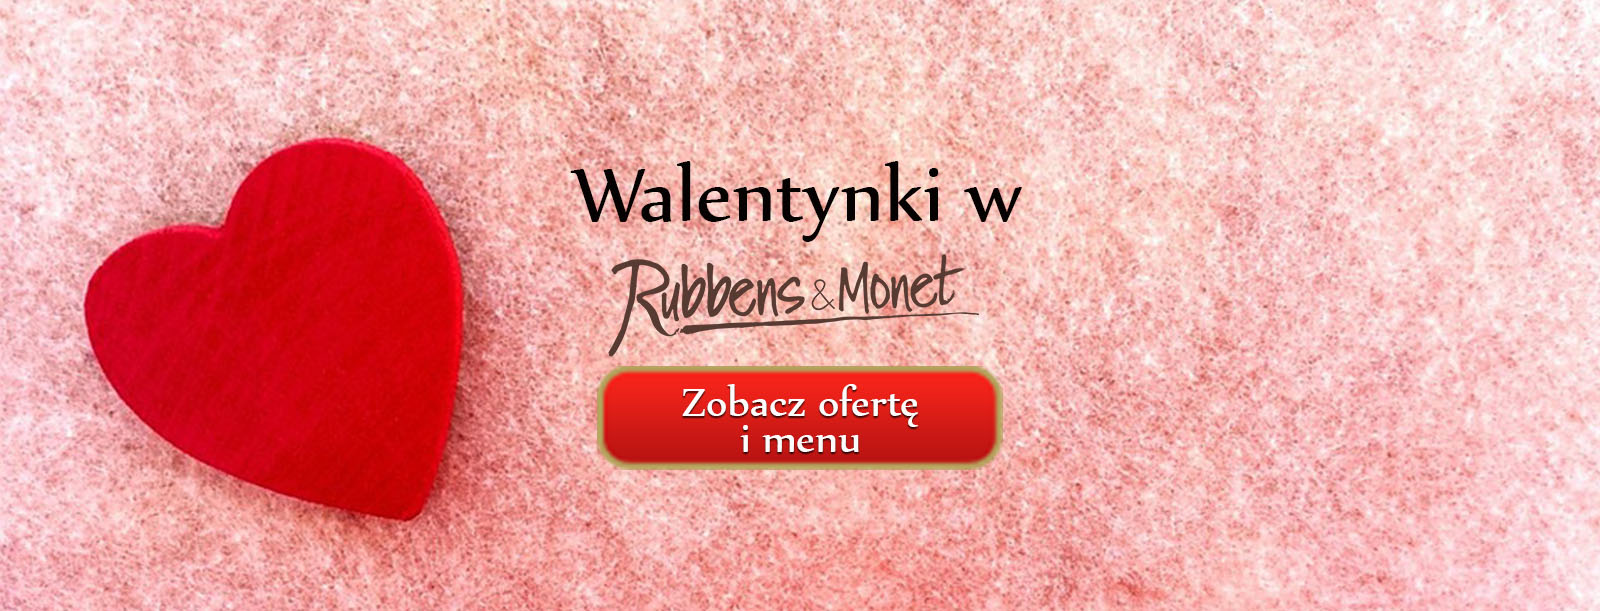 walentynki w rubbens&monet